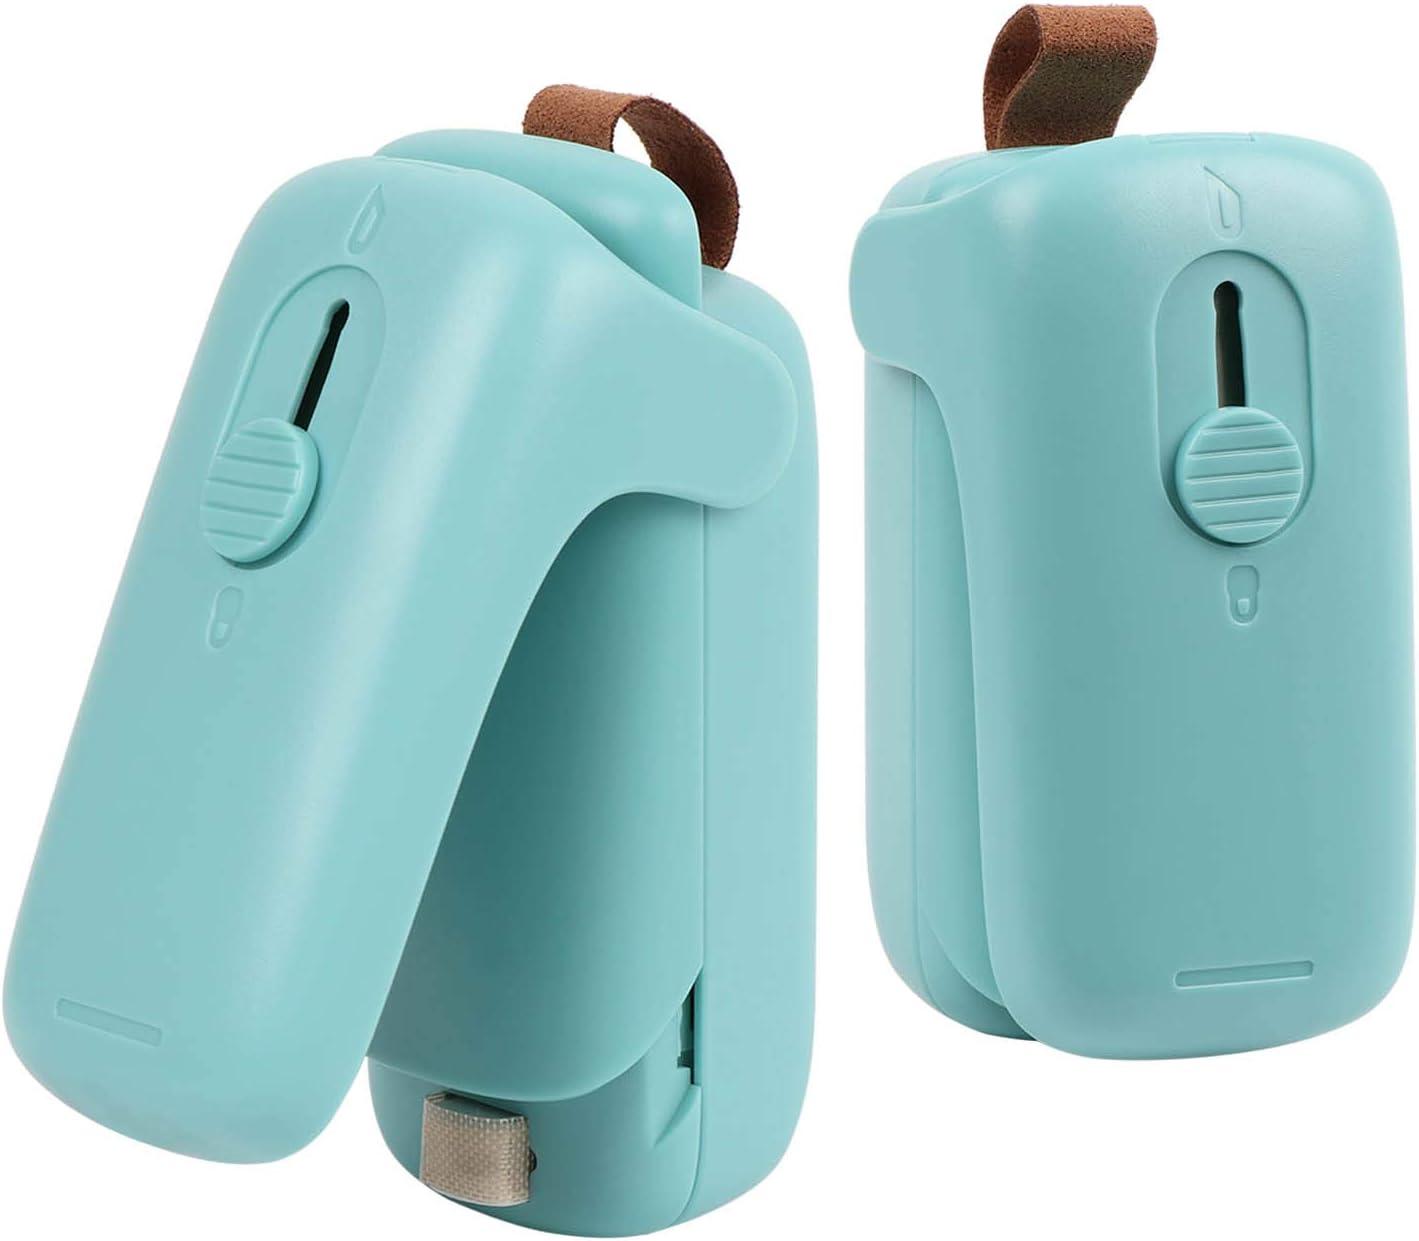 2 Pieces Bag Sealer Mini , 2 in 1 Bag Sealer Heat Seal Handheld Heat Vacuum Sealer with Cutter Portable Bag Resealer Sealer for Plastic Bags Food Storage Fruit Snack Fresh Bag Sealer (Battery Not Included)